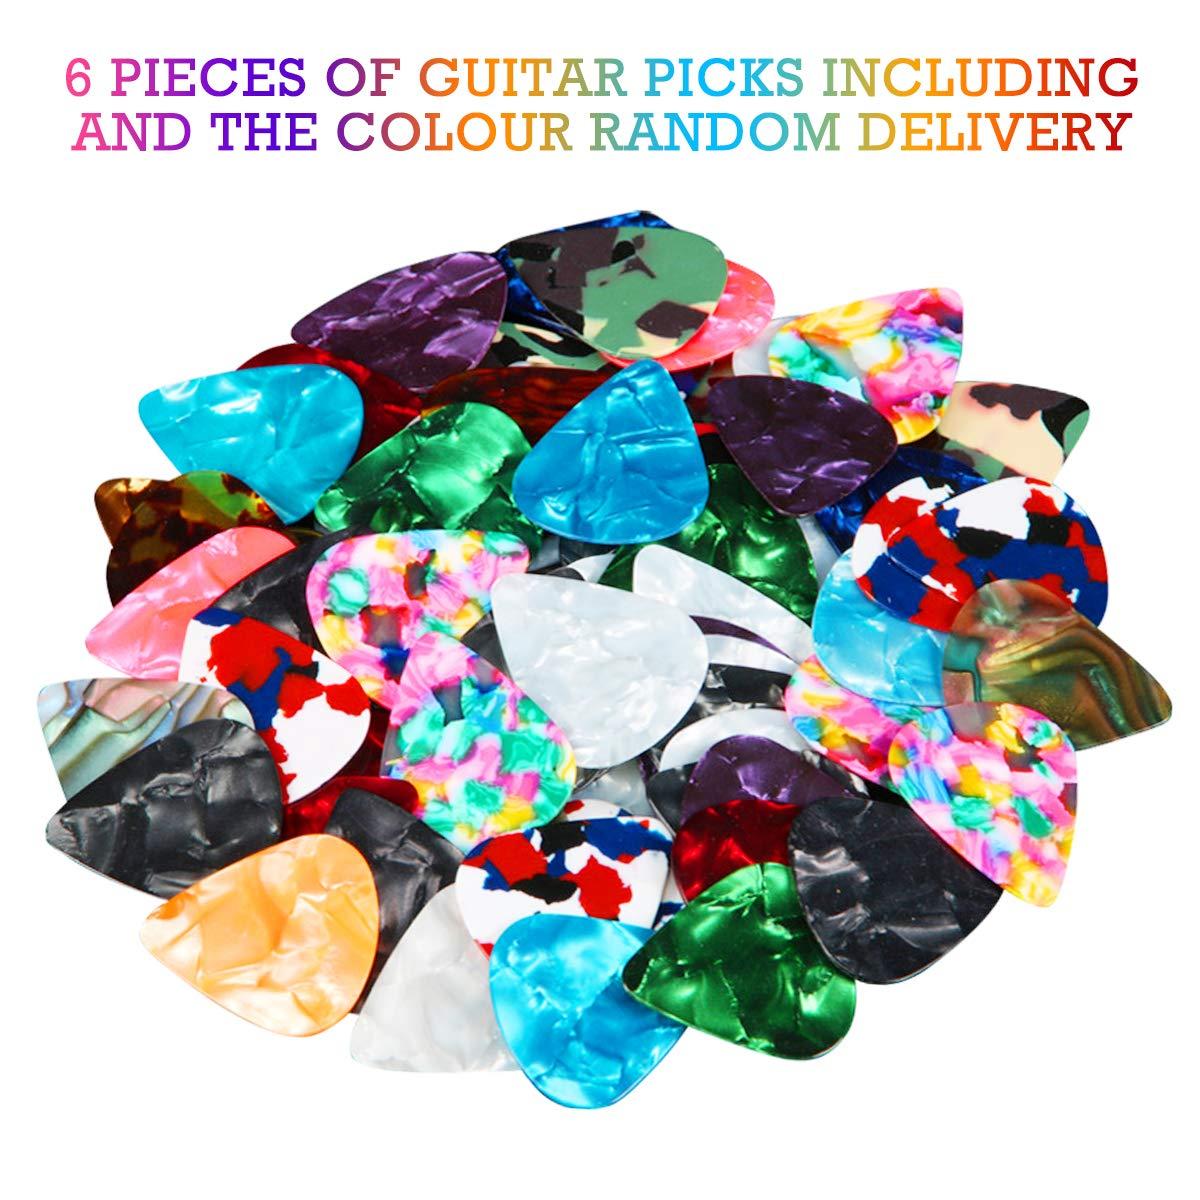 con 6 P/úas de Guitarra Longitud Ajustable 98 a 153cm Marr/ón Correa de Guitarra NASUM Ajustable para Guitarra Ac/ústica El/éctrica Bass Ukelele para Hombres//Mujeres//Ni/ños